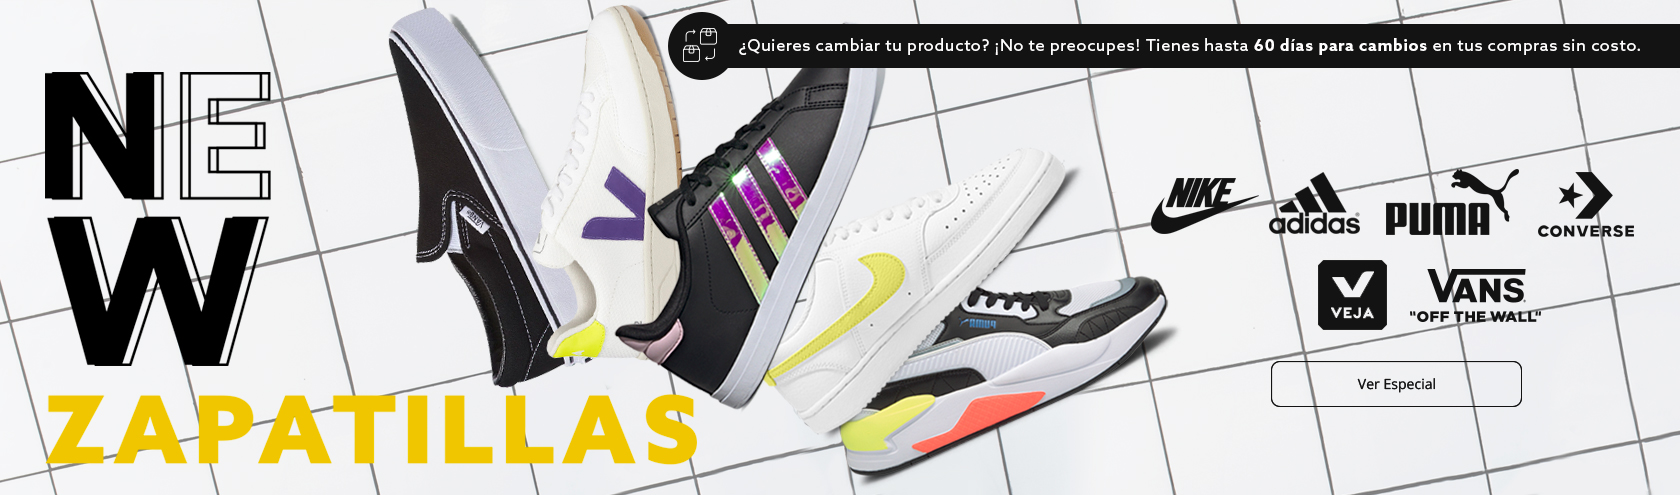 Zapatillas New In